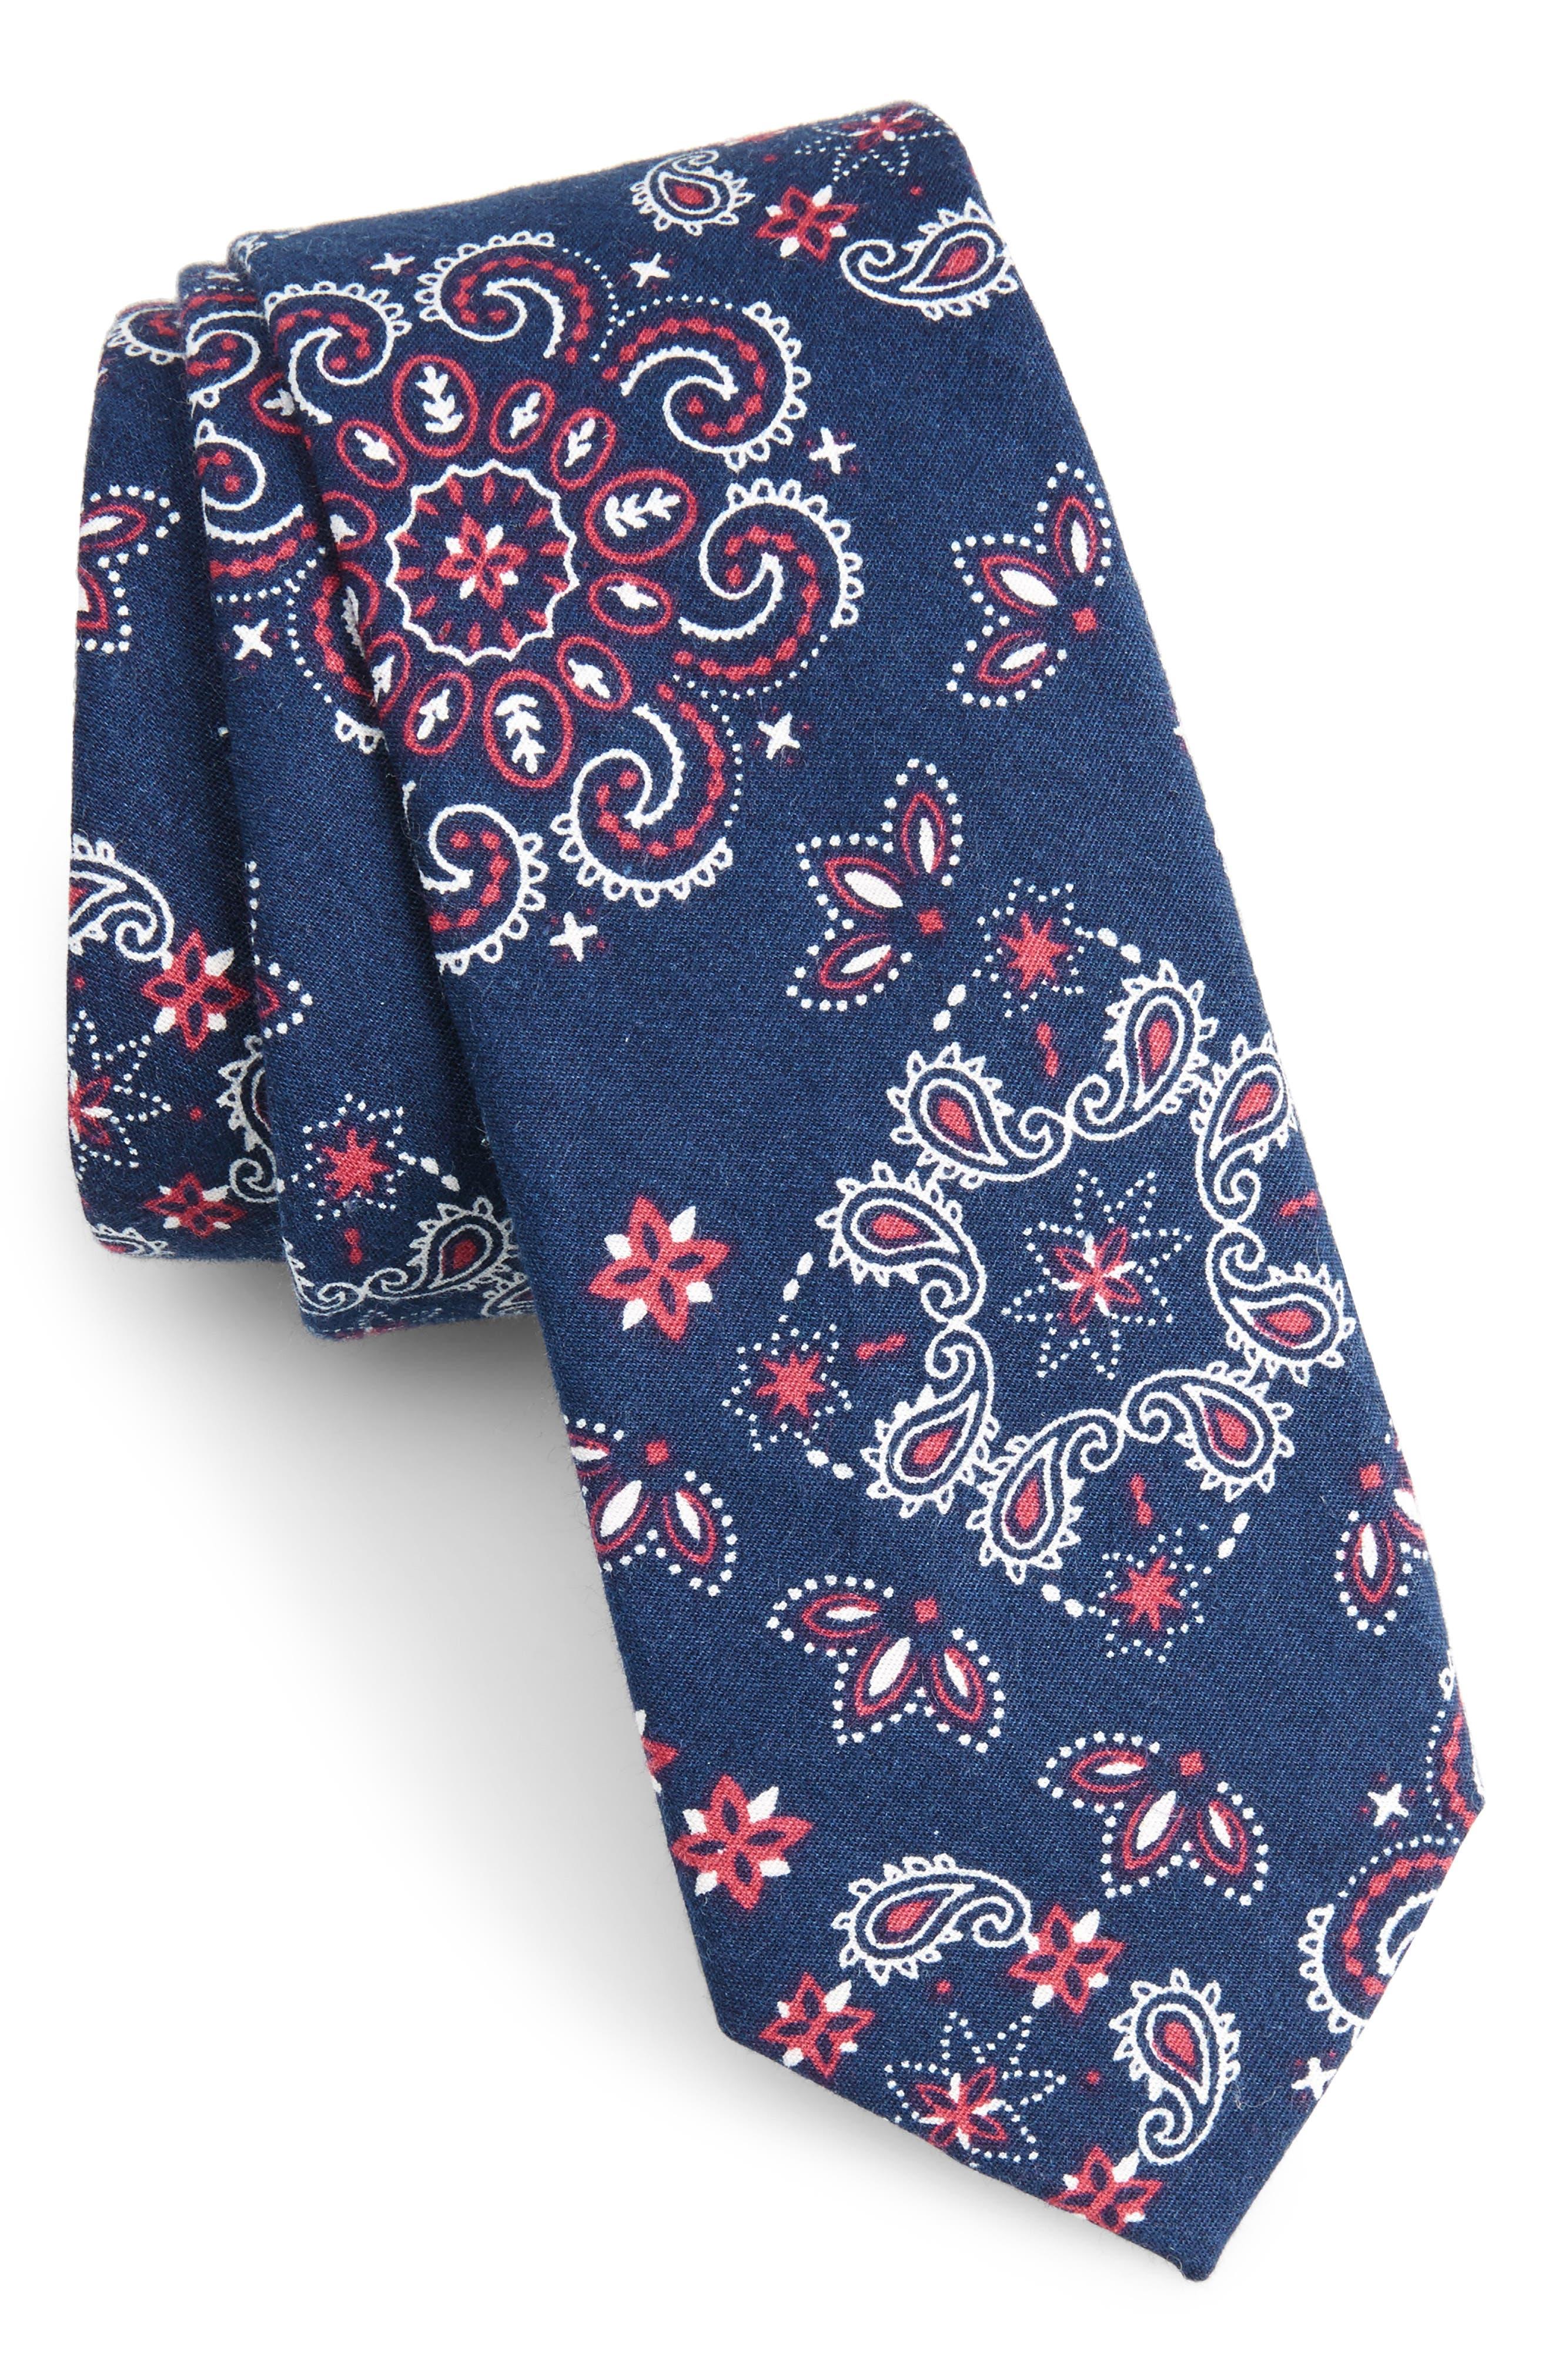 Alternate Image 1 Selected - Nordstrom Men's Shop Leblanc Paisley Cotton Skinny Tie